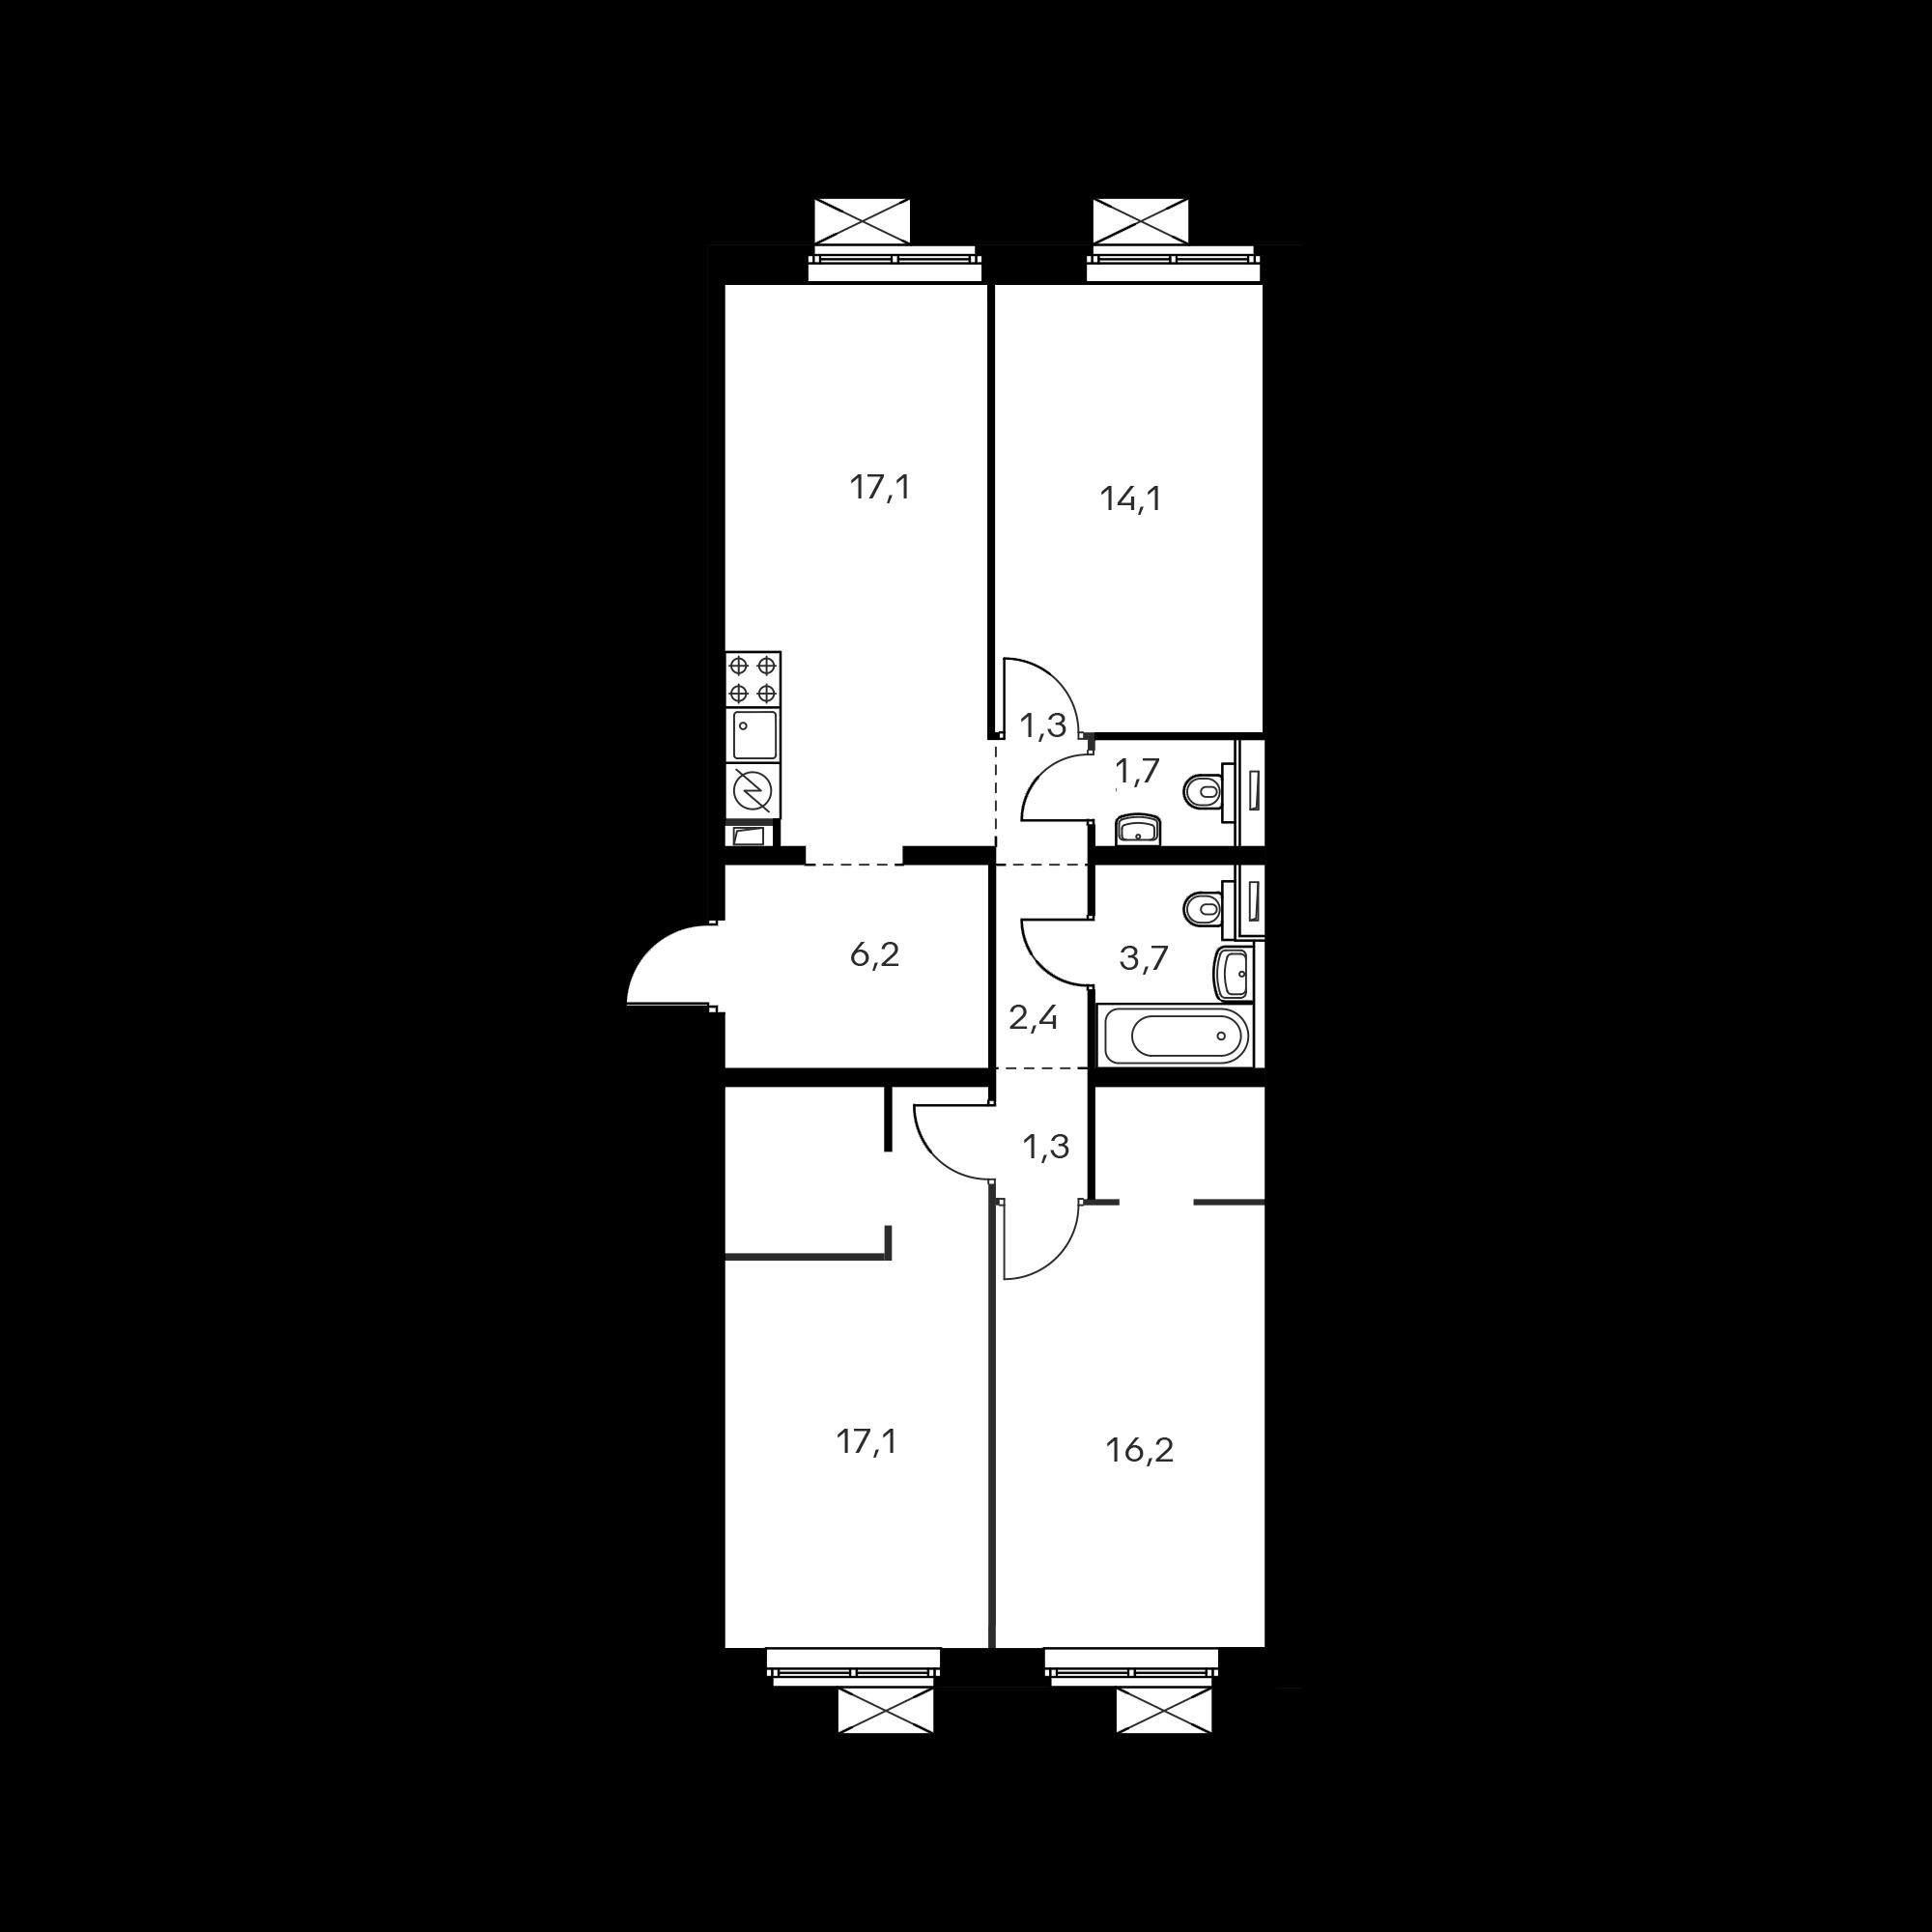 3KM16_6.0-1_S_Z_02